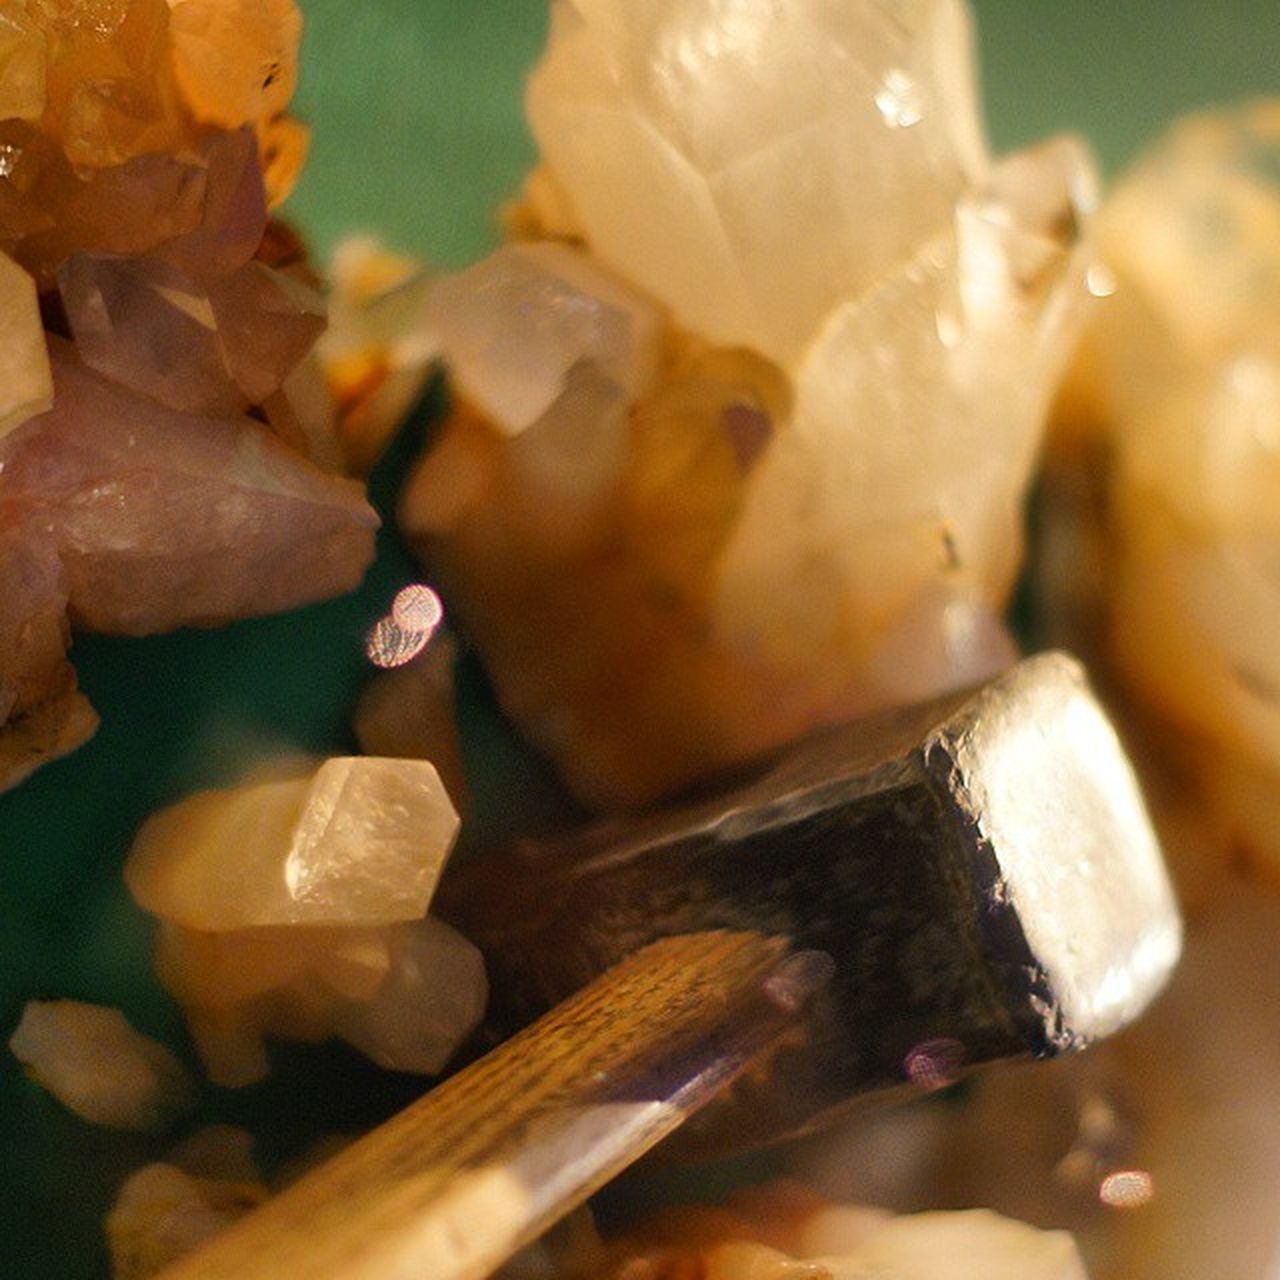 Crystals . At the Electron Microscopes Exhibition at the DeutchesMuseum museum. Taken by MY SonyAlpha Dslr A57 . münchen Munich bayarn Bavaria Germany Deutschland. متحف قسم مايكروسكوب كريستال علوم ميونخ المانيا بافاريا